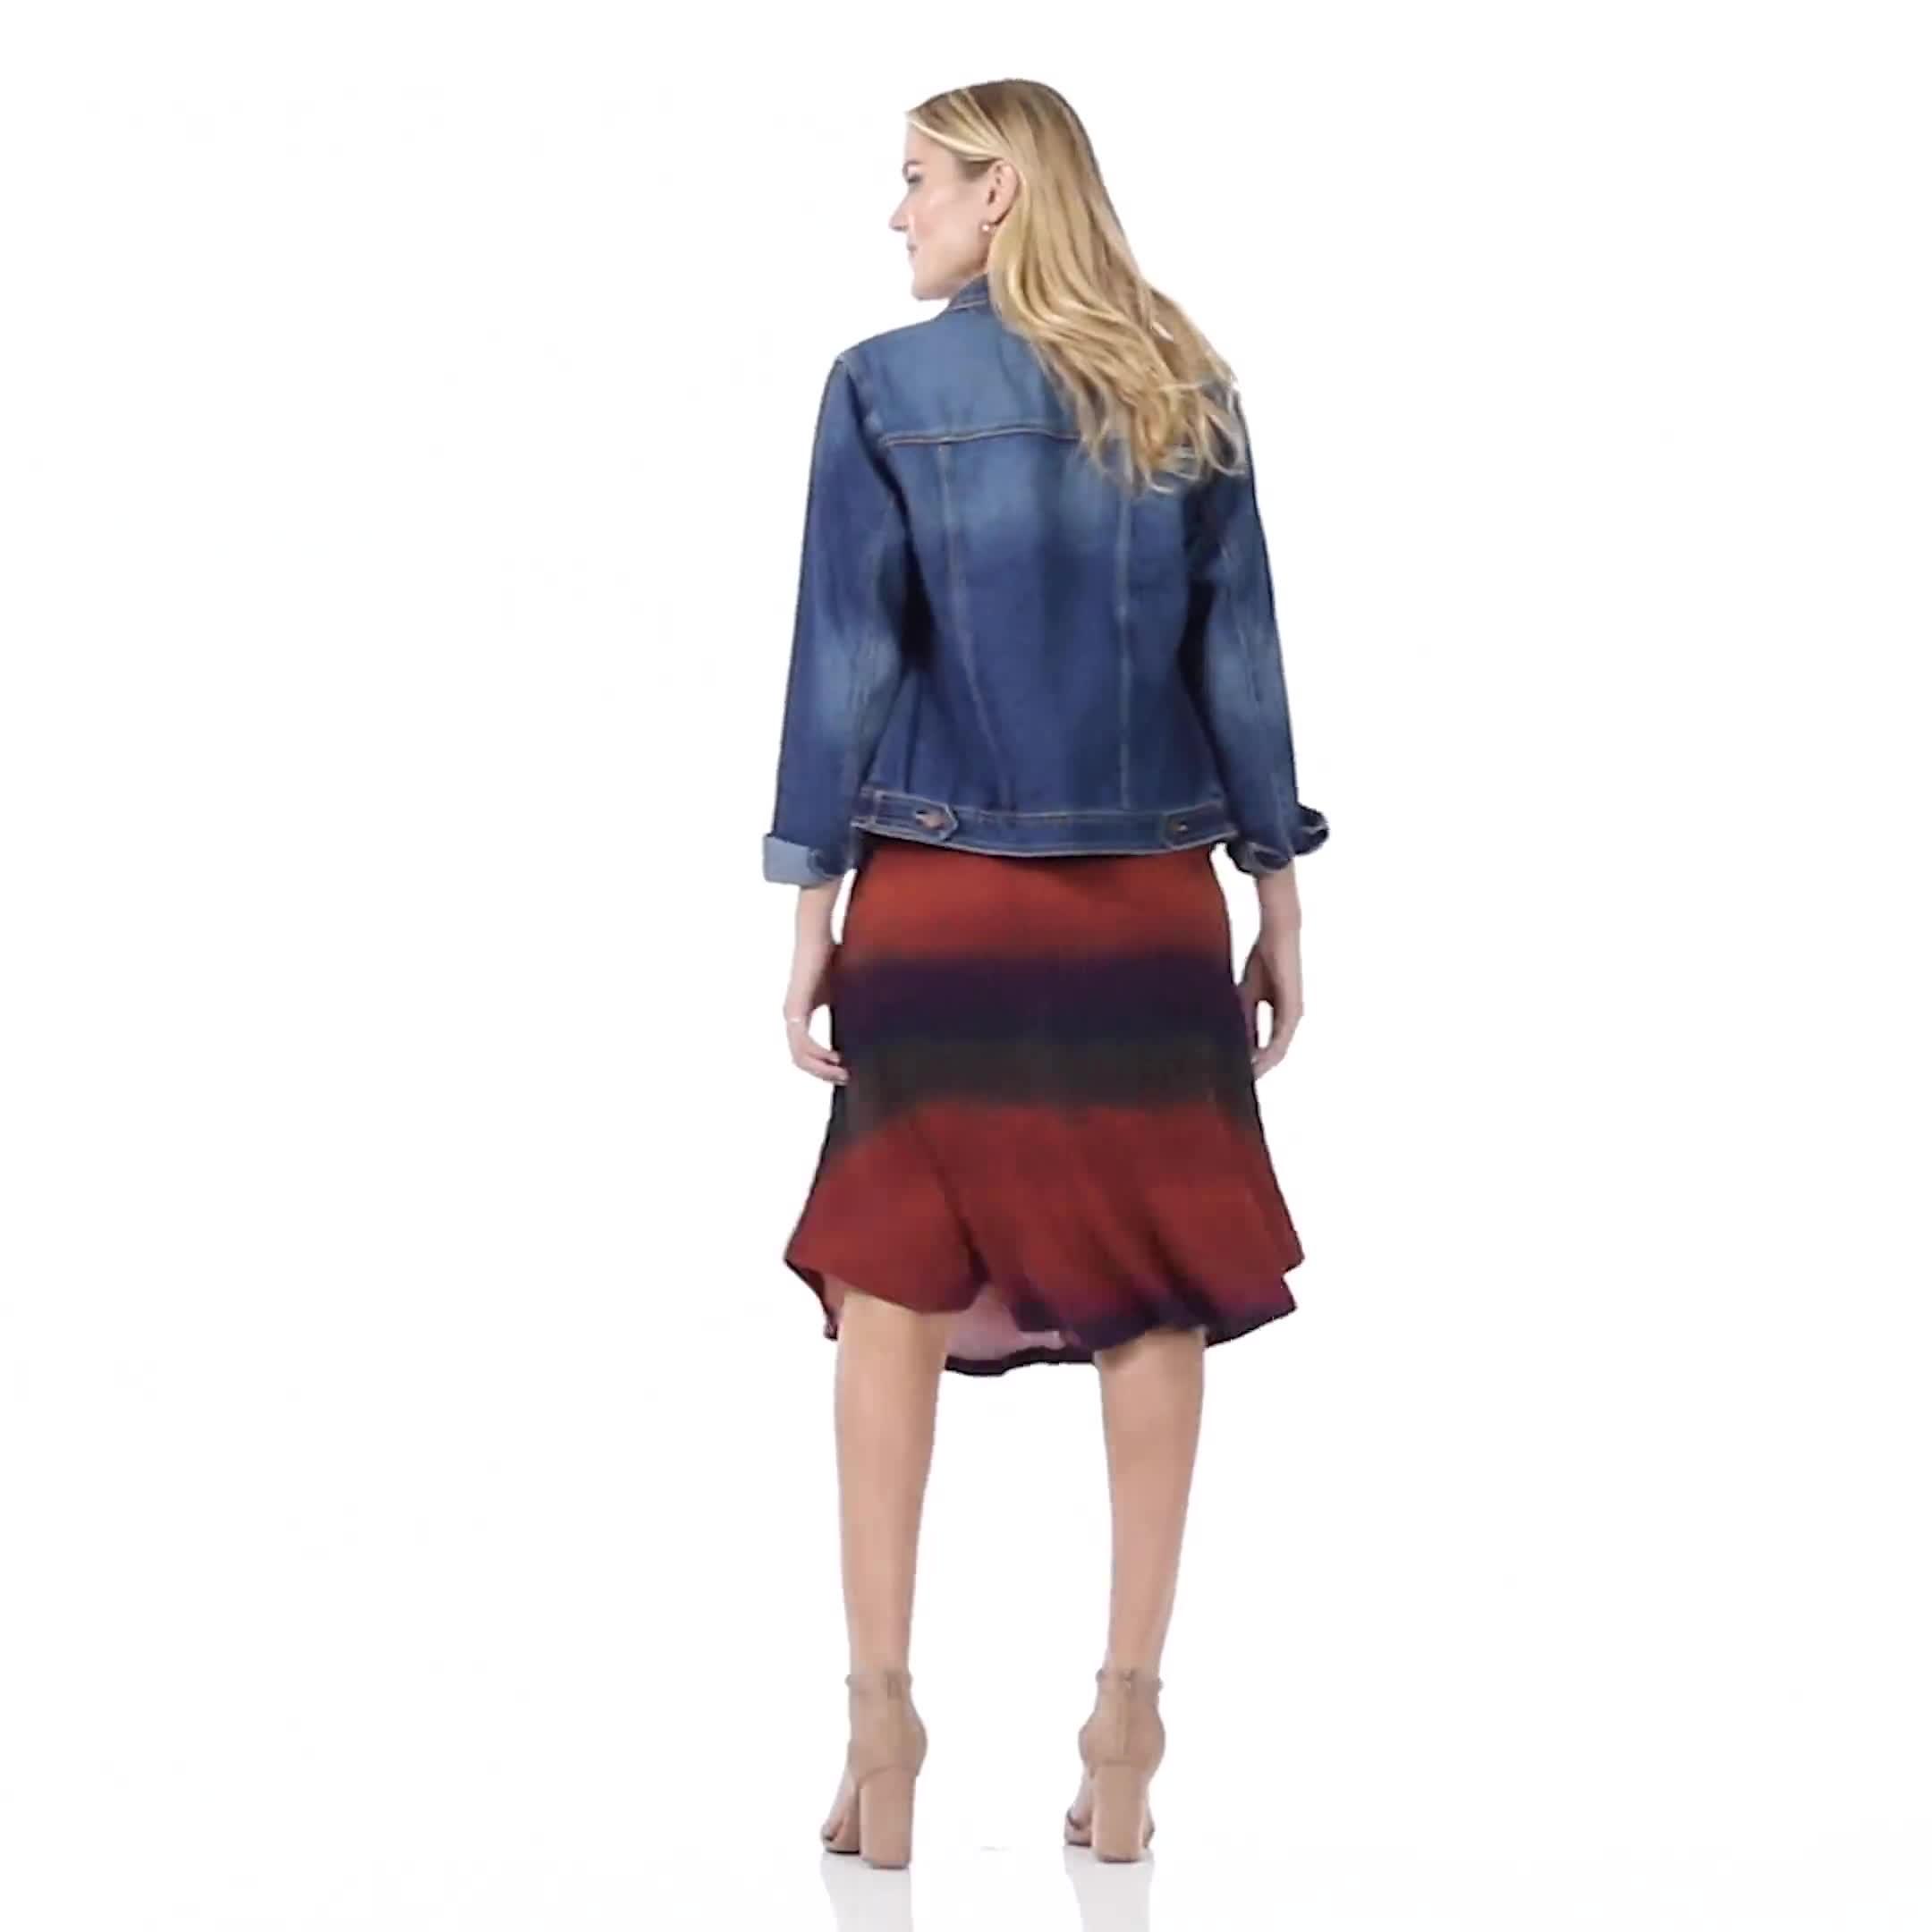 Dip Dye Rib Knit Pull On Skirt - Video